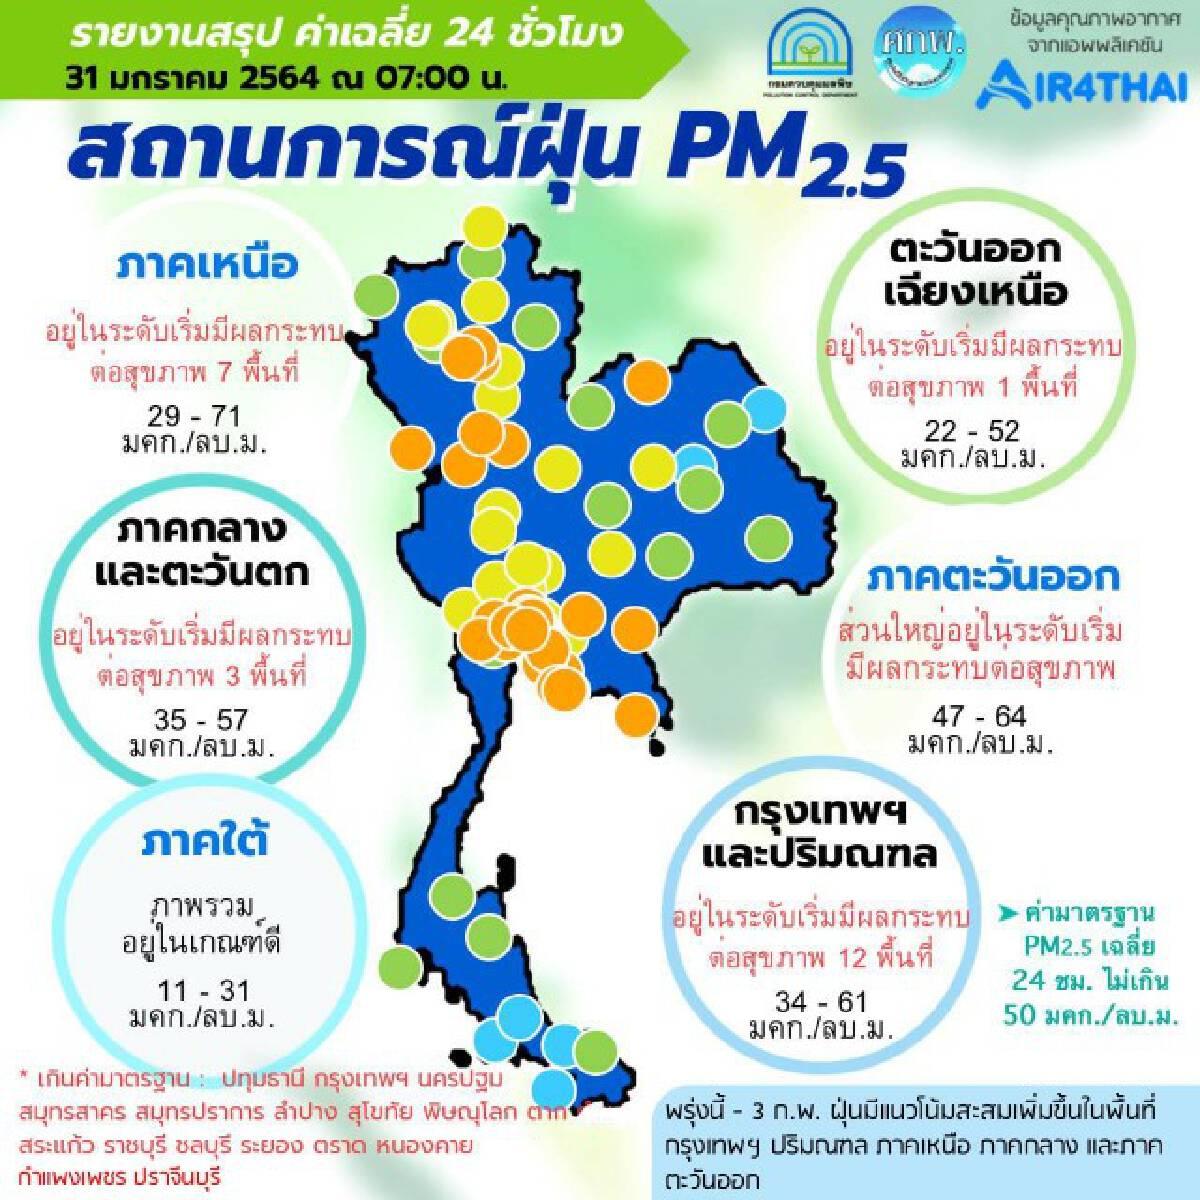 """PM2.5"" เกินมาตรฐาน 17 จังหวัด ""กทม.-ปริมณฑล"" เกิน 12 พื้นที่"